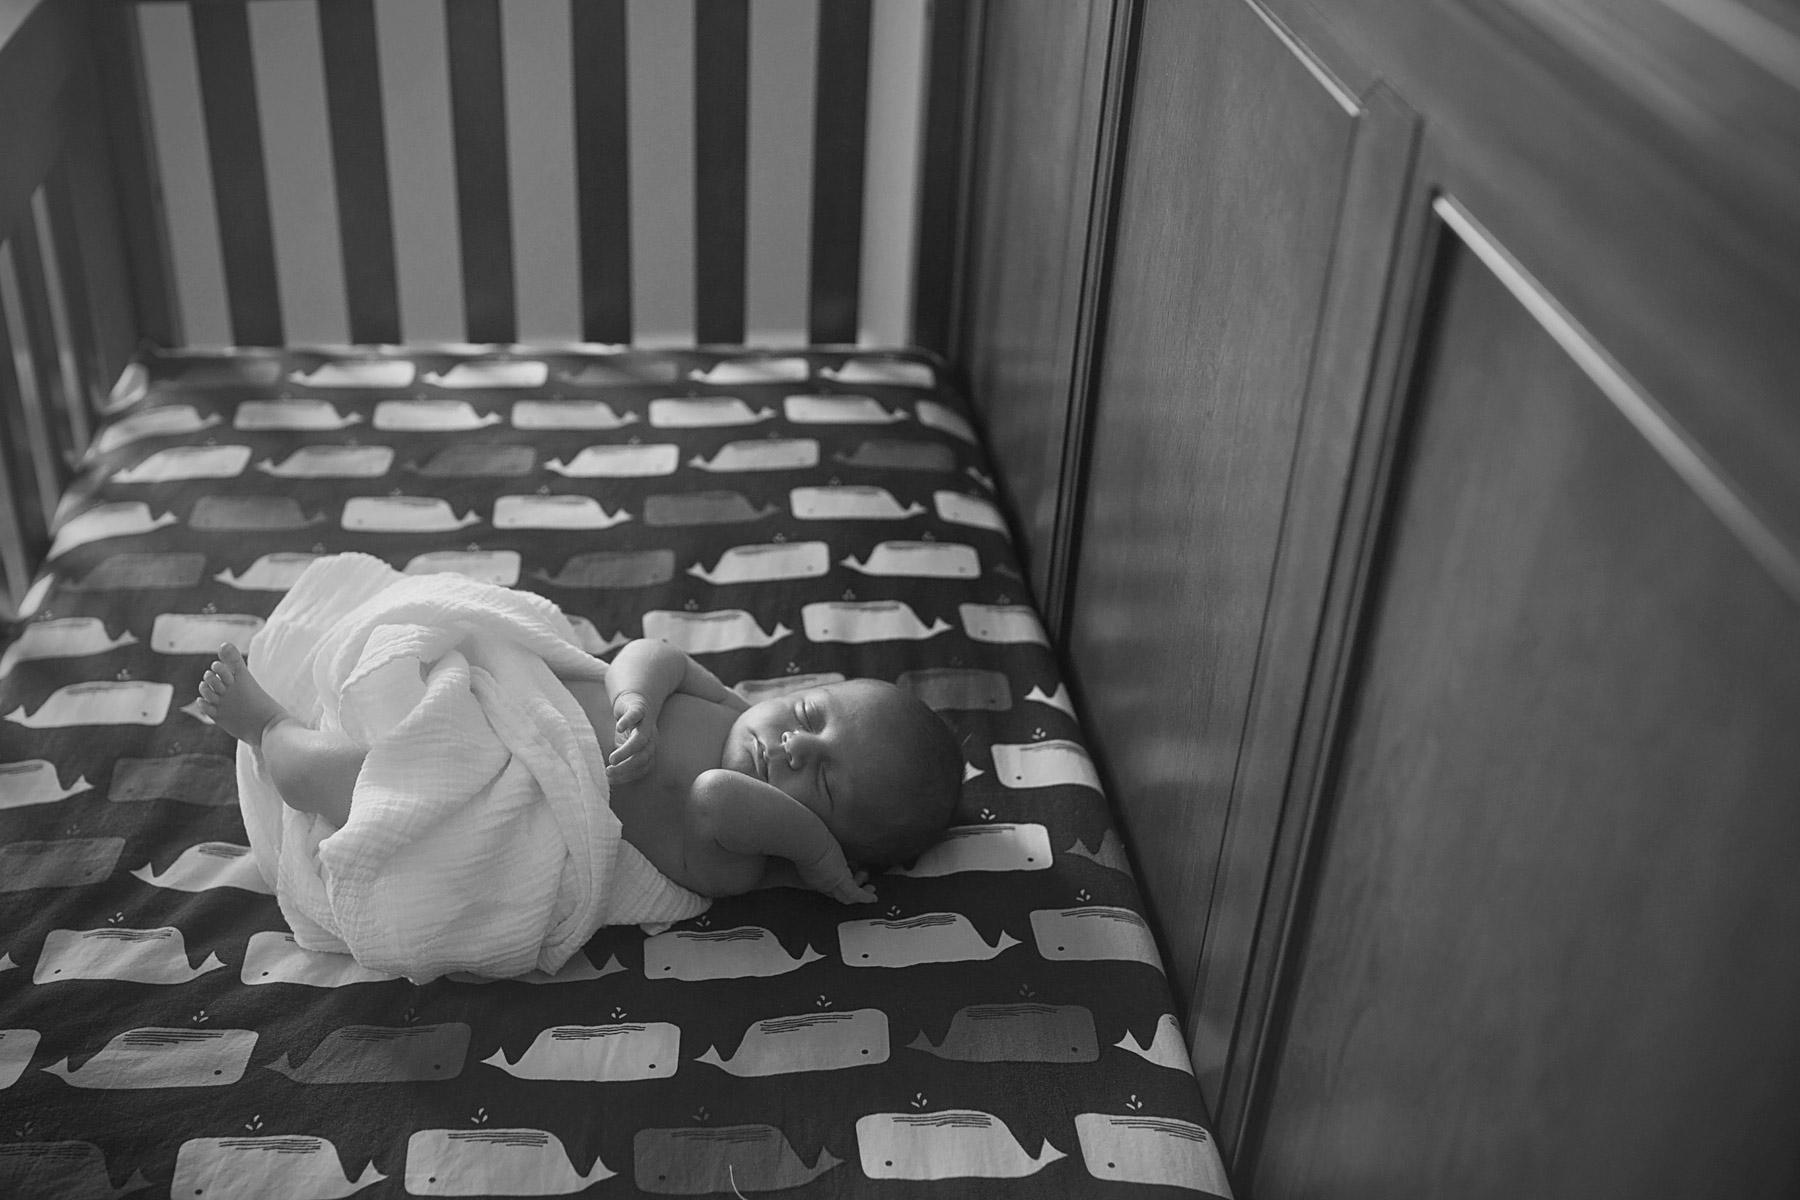 Main_Line_Newborn_photographer_Lifestyle_newborn_photographer02_sleeping_newborn.JPG